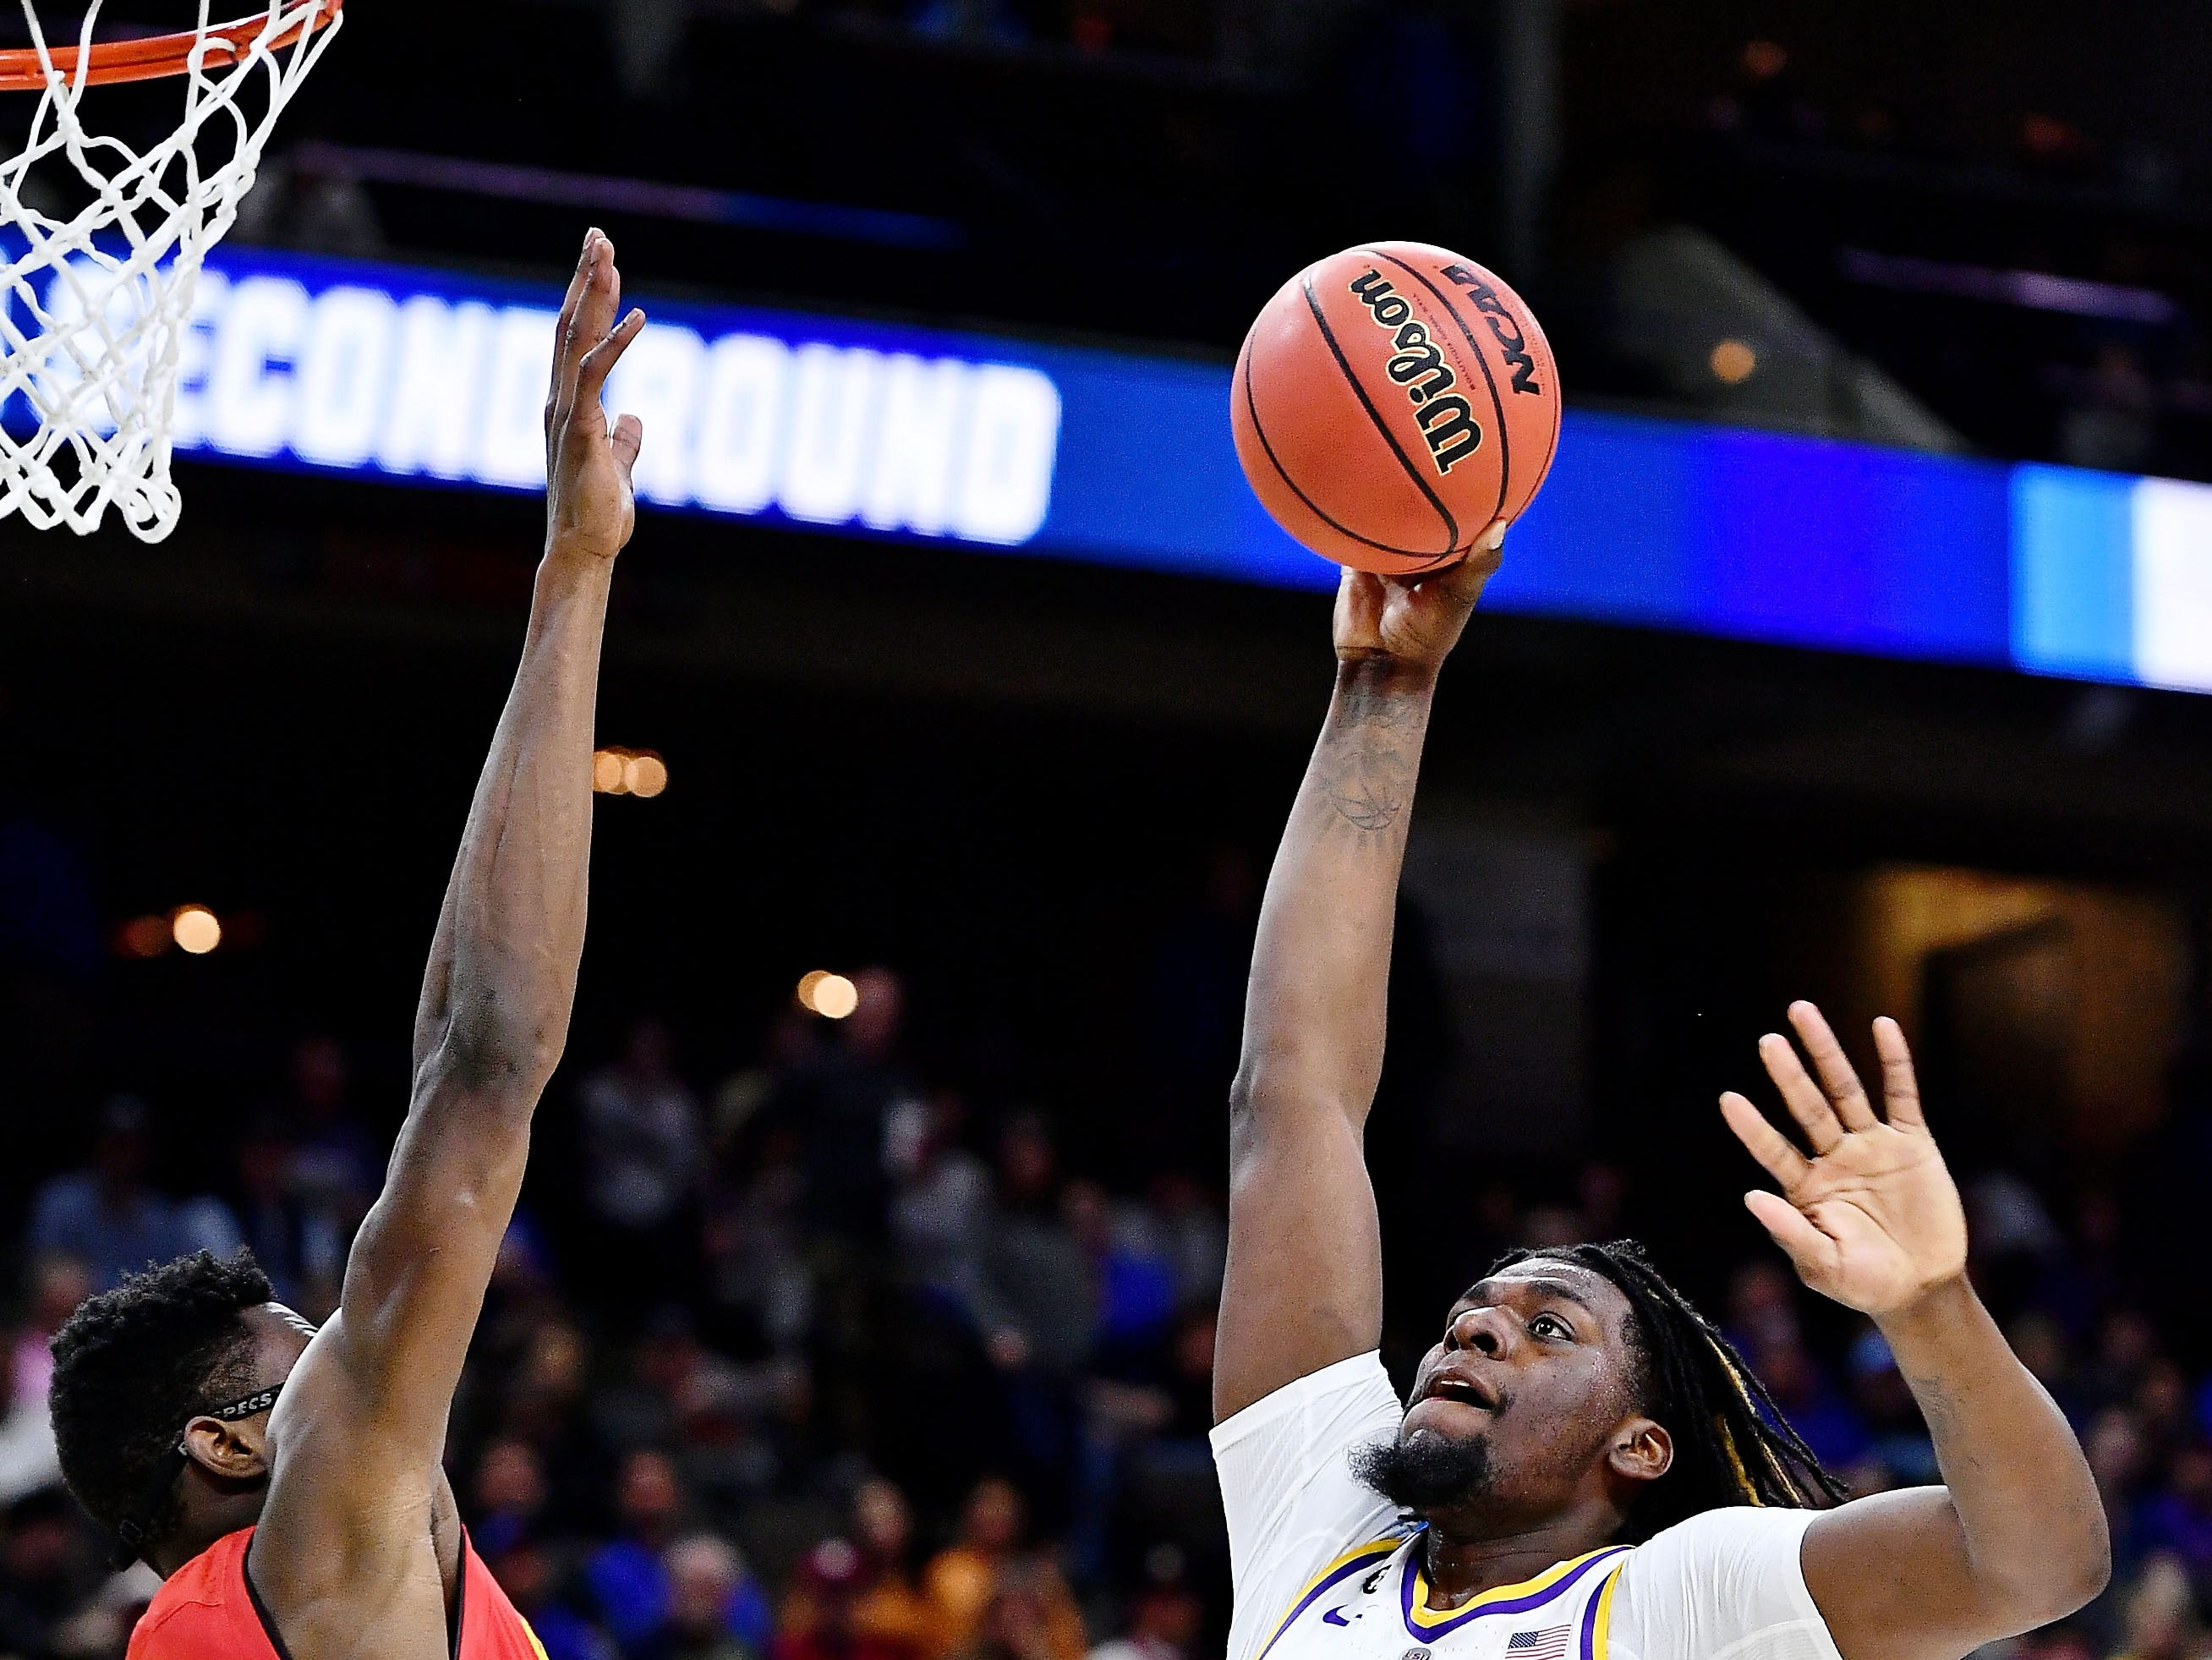 NCAA Tournament: LSU's Tremont Waters dedicates game winner vs. Maryland to Wayde Sims